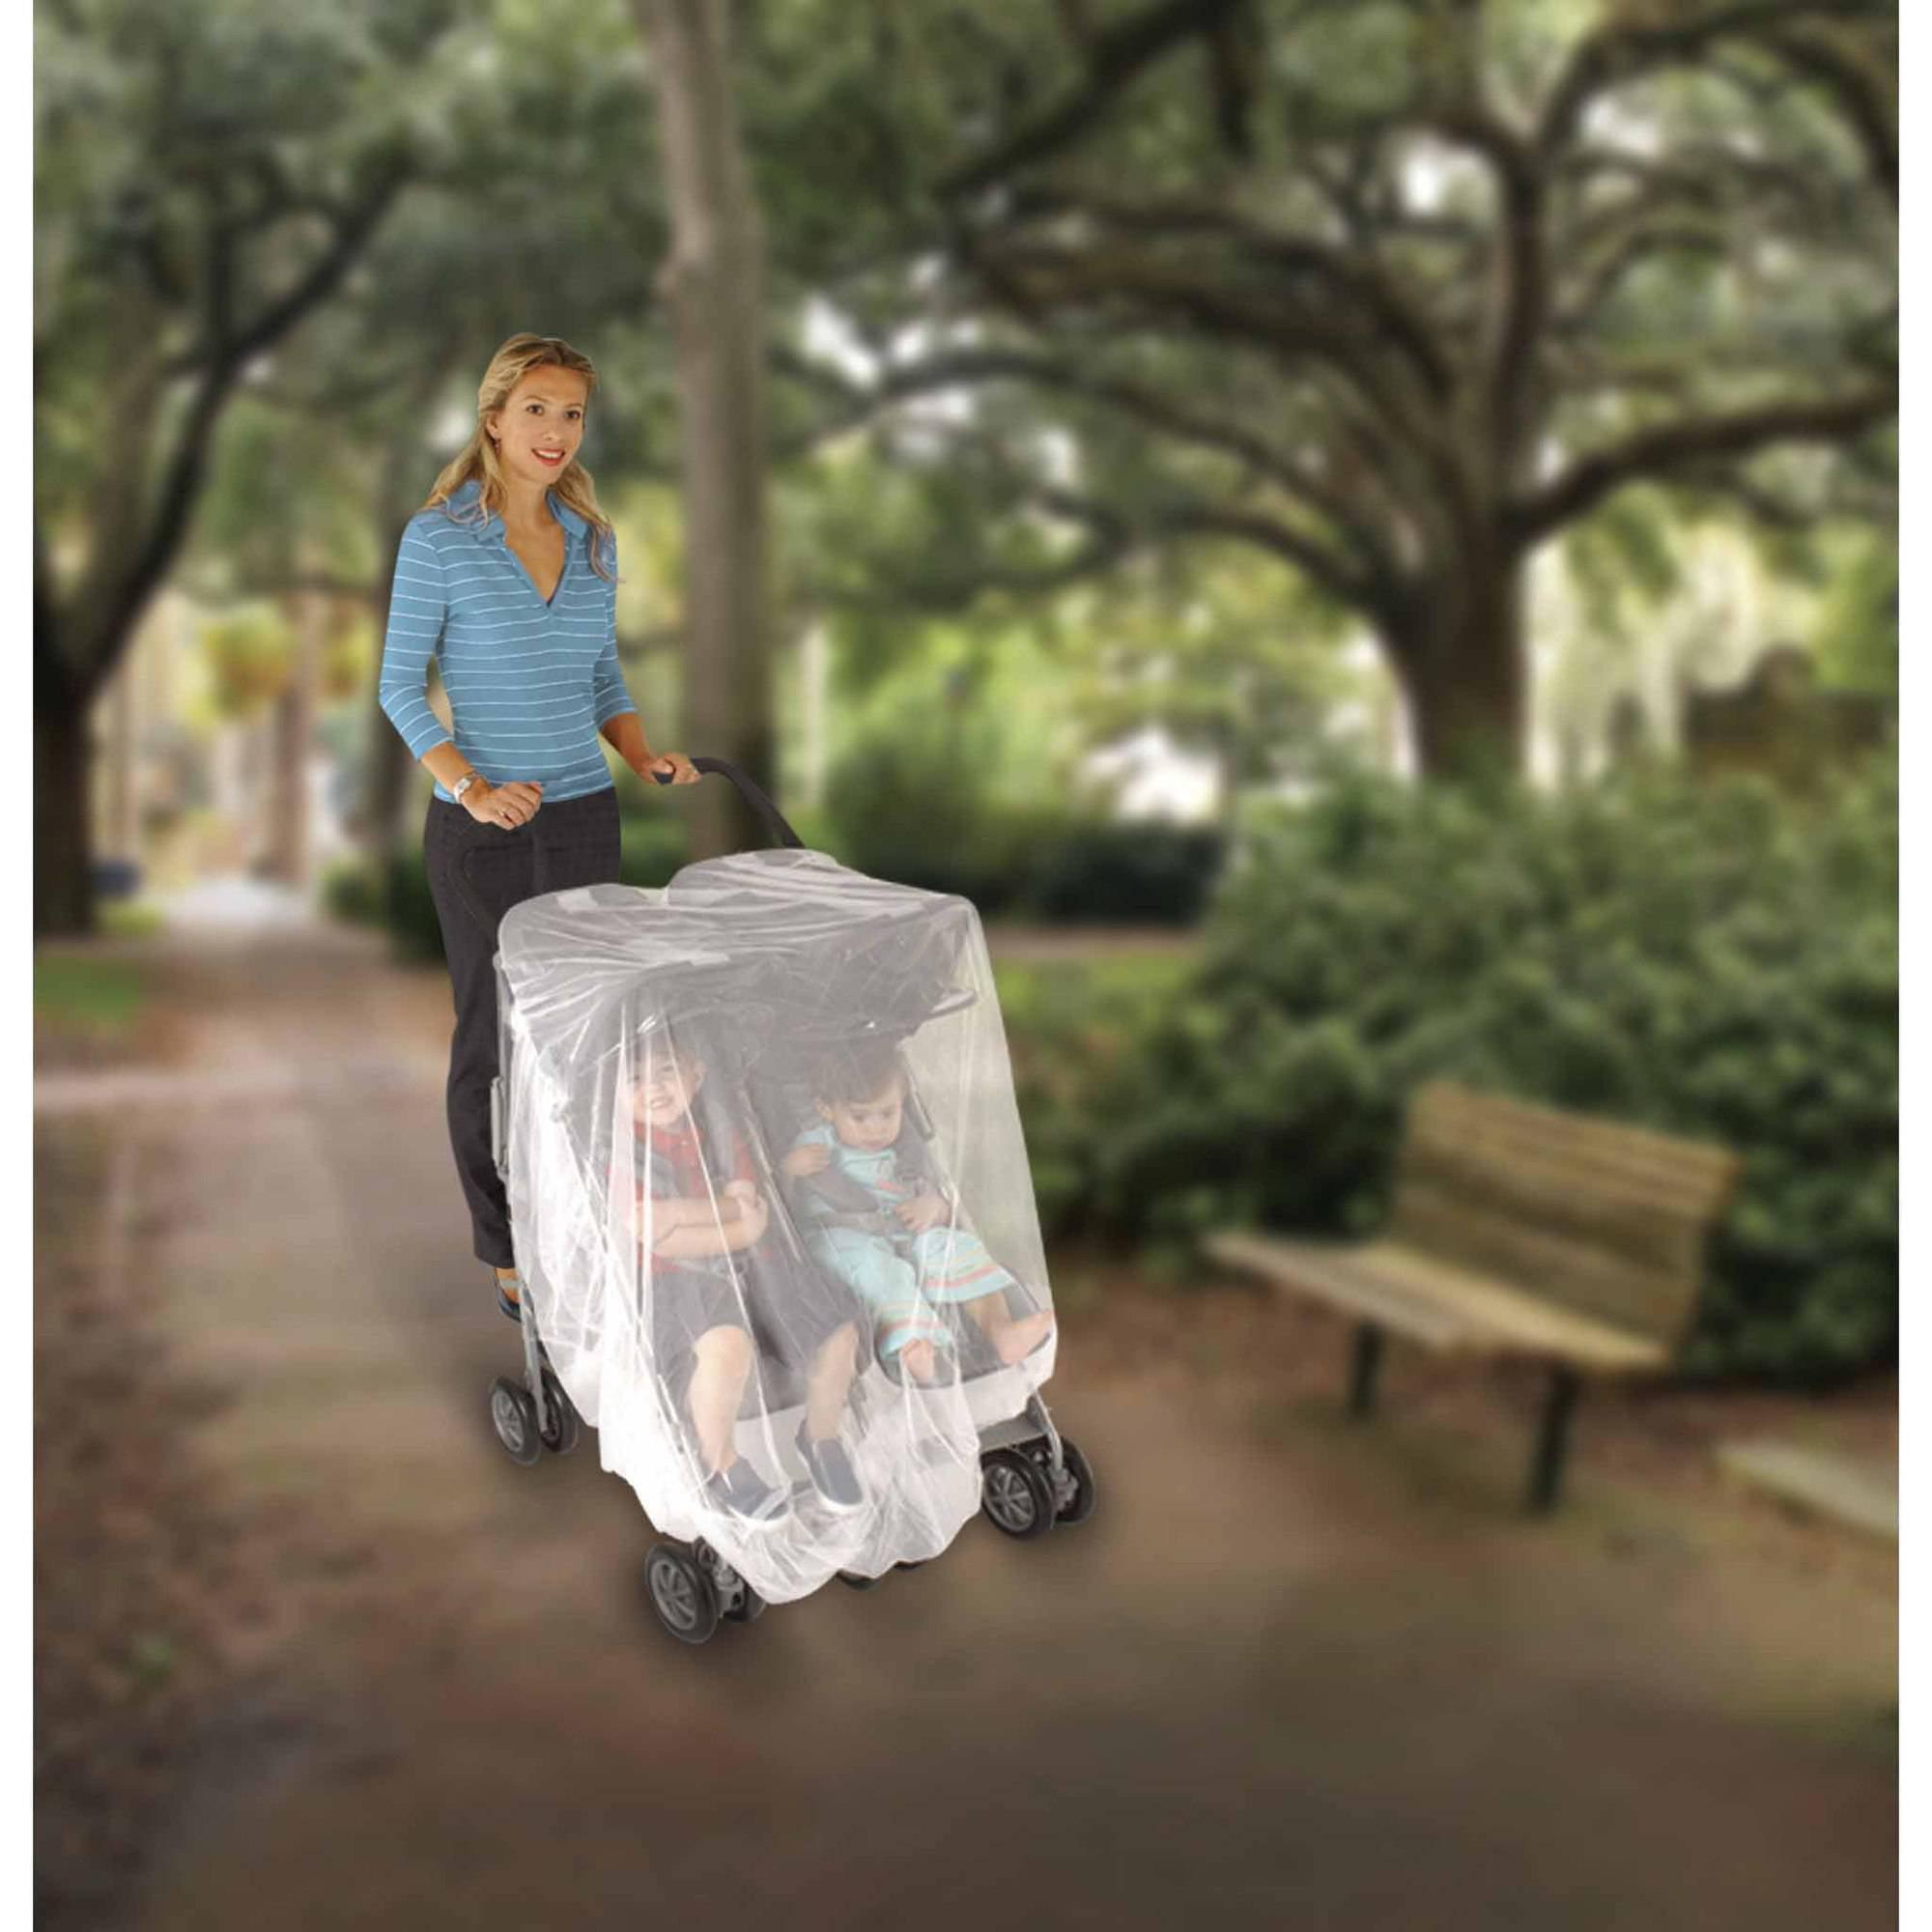 Nuby Double Stroller Netting